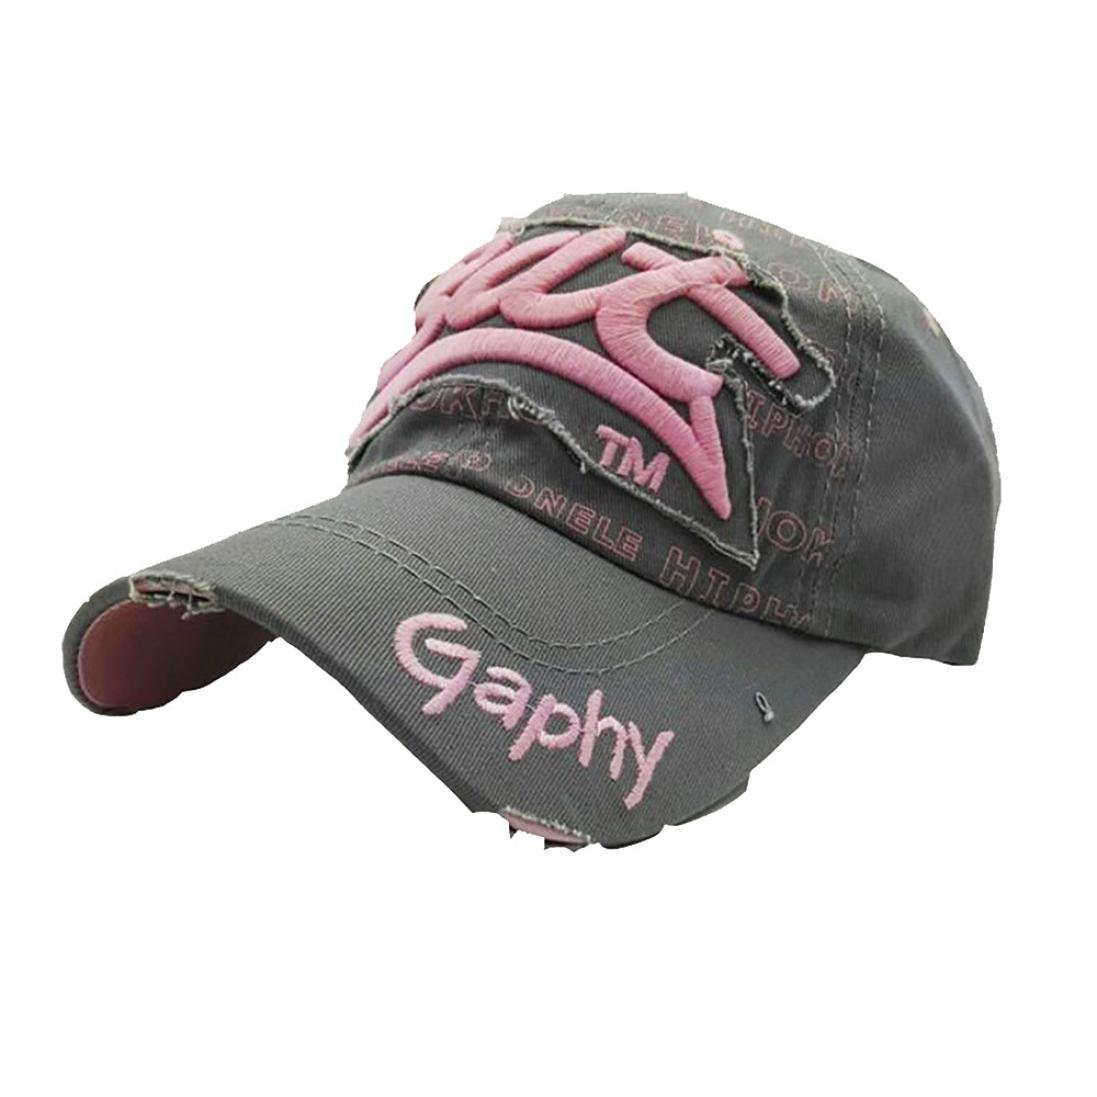 Embroidered Summer Cap Hats for Men Women Casual Hats Hip Hop Baseball Caps Black